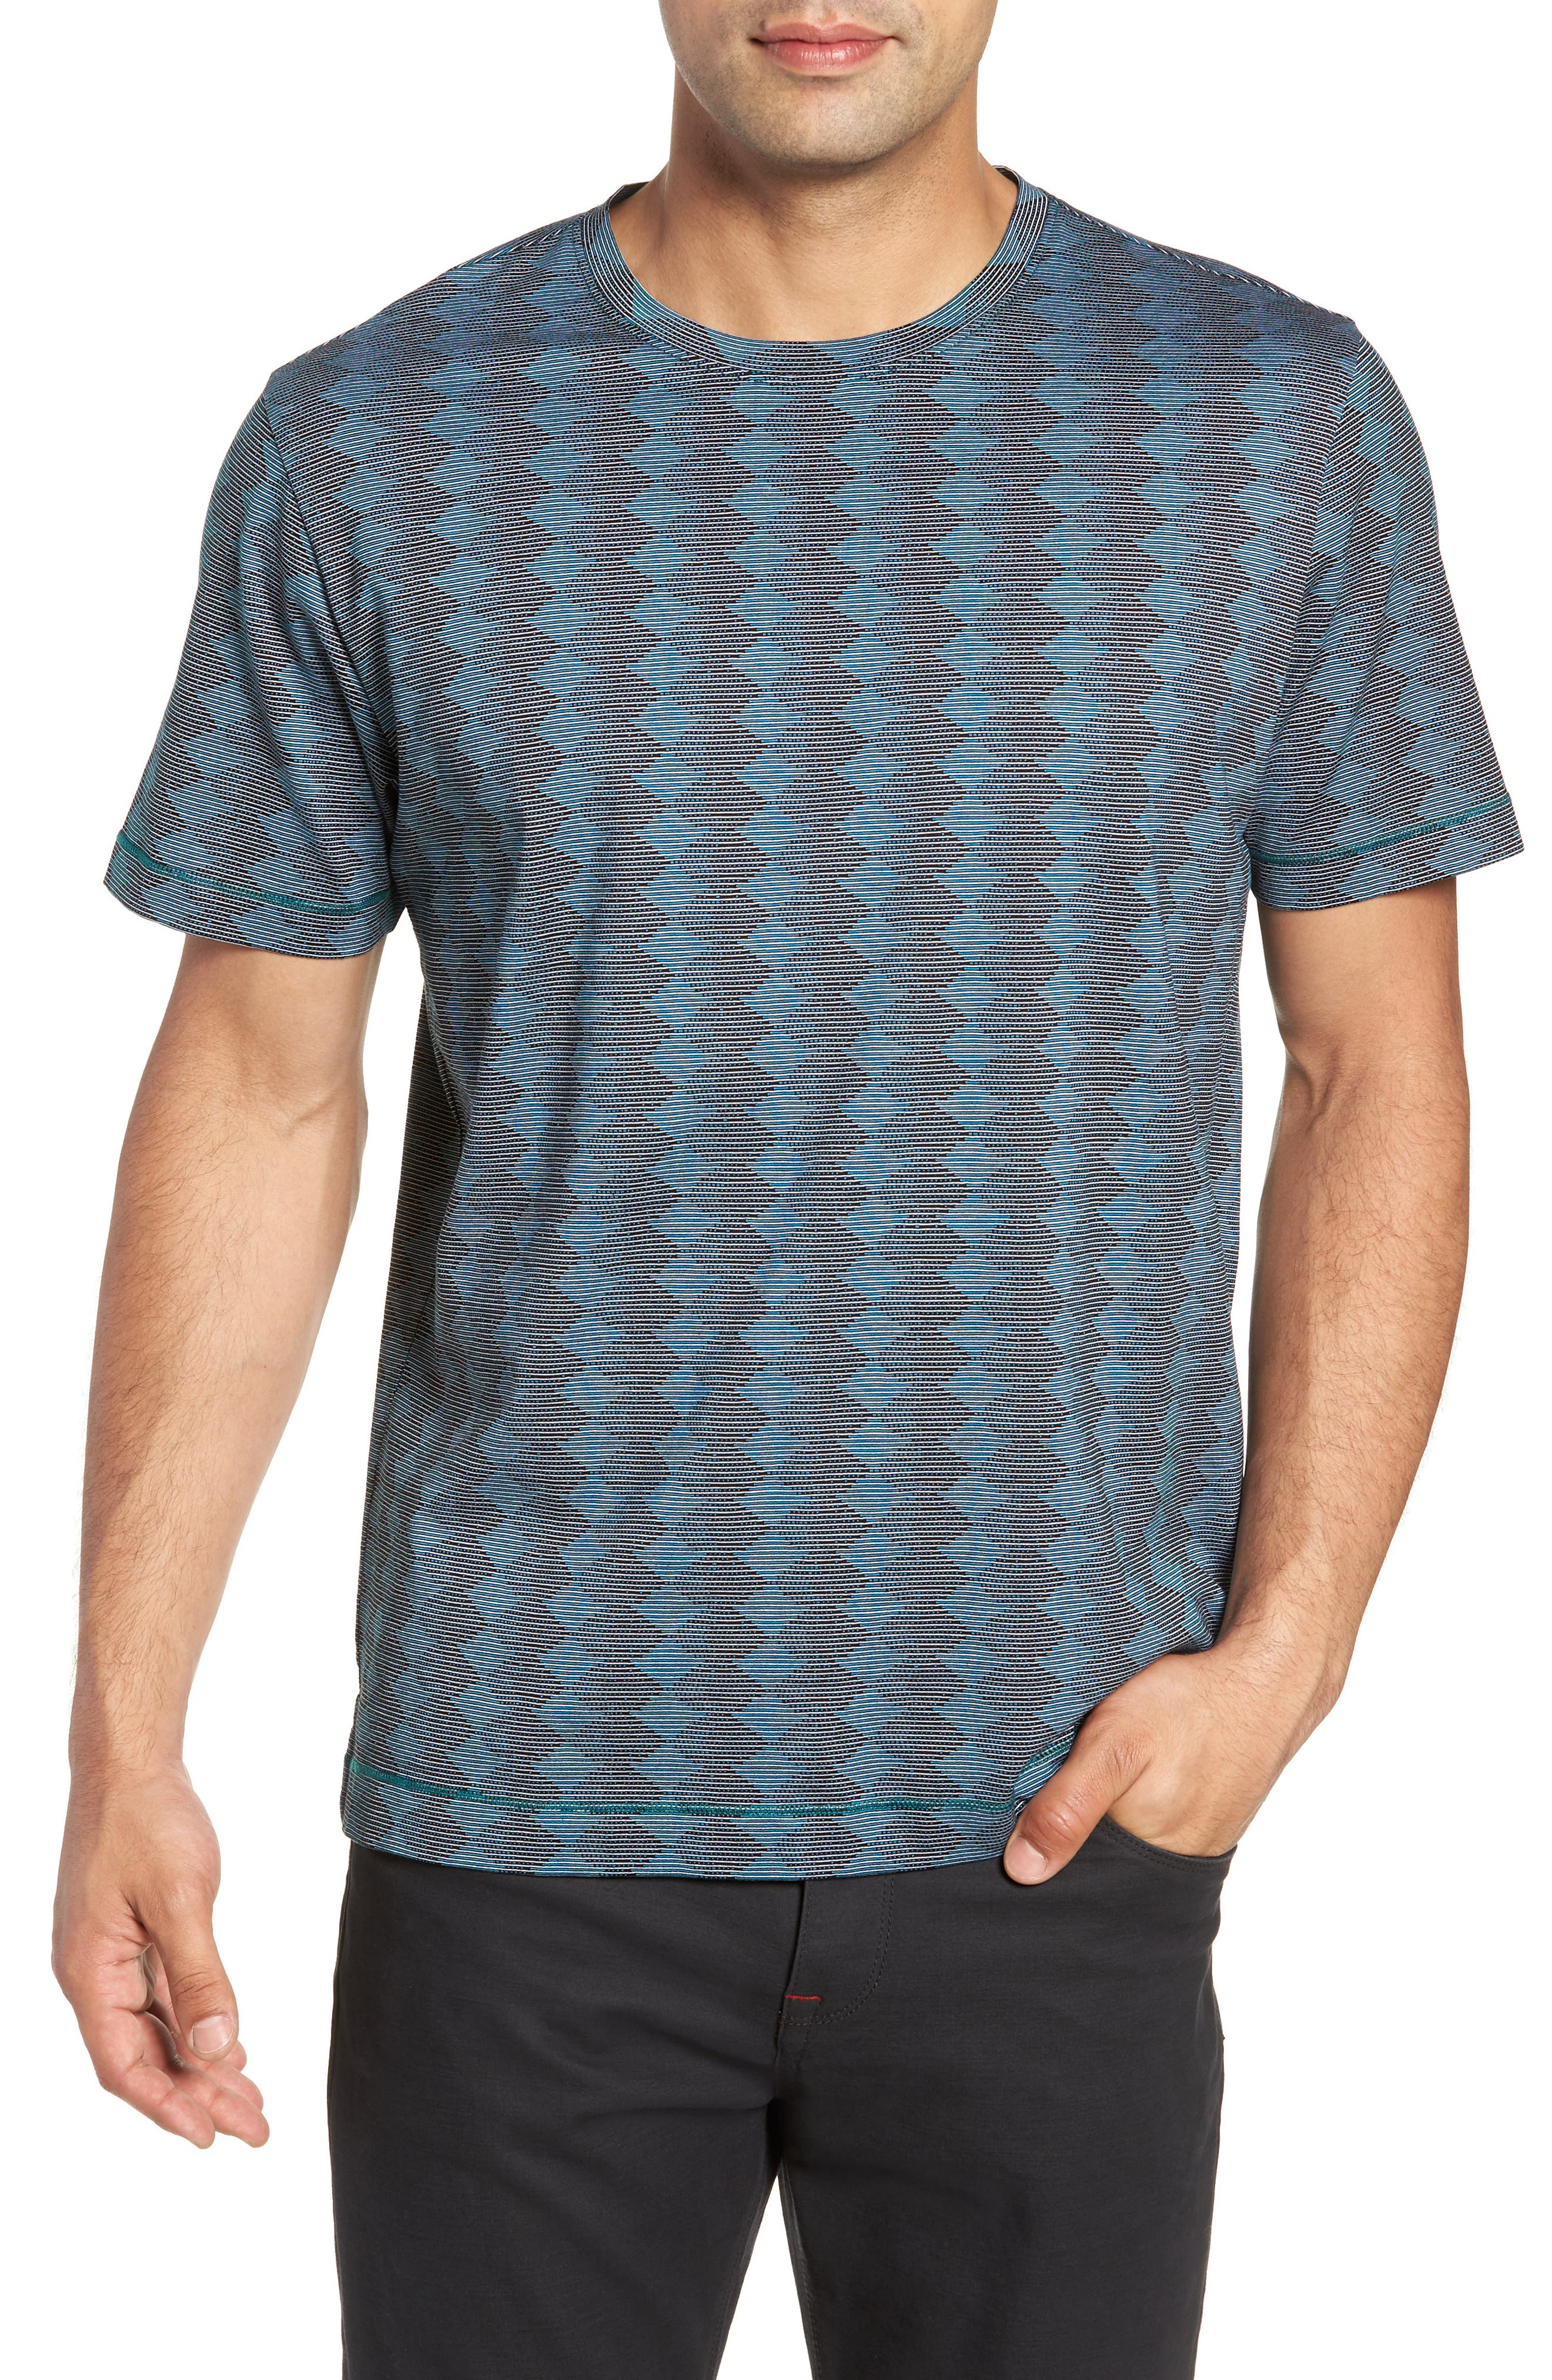 Philippe T-Shirt,                             Main thumbnail 1, color,                             TEAL